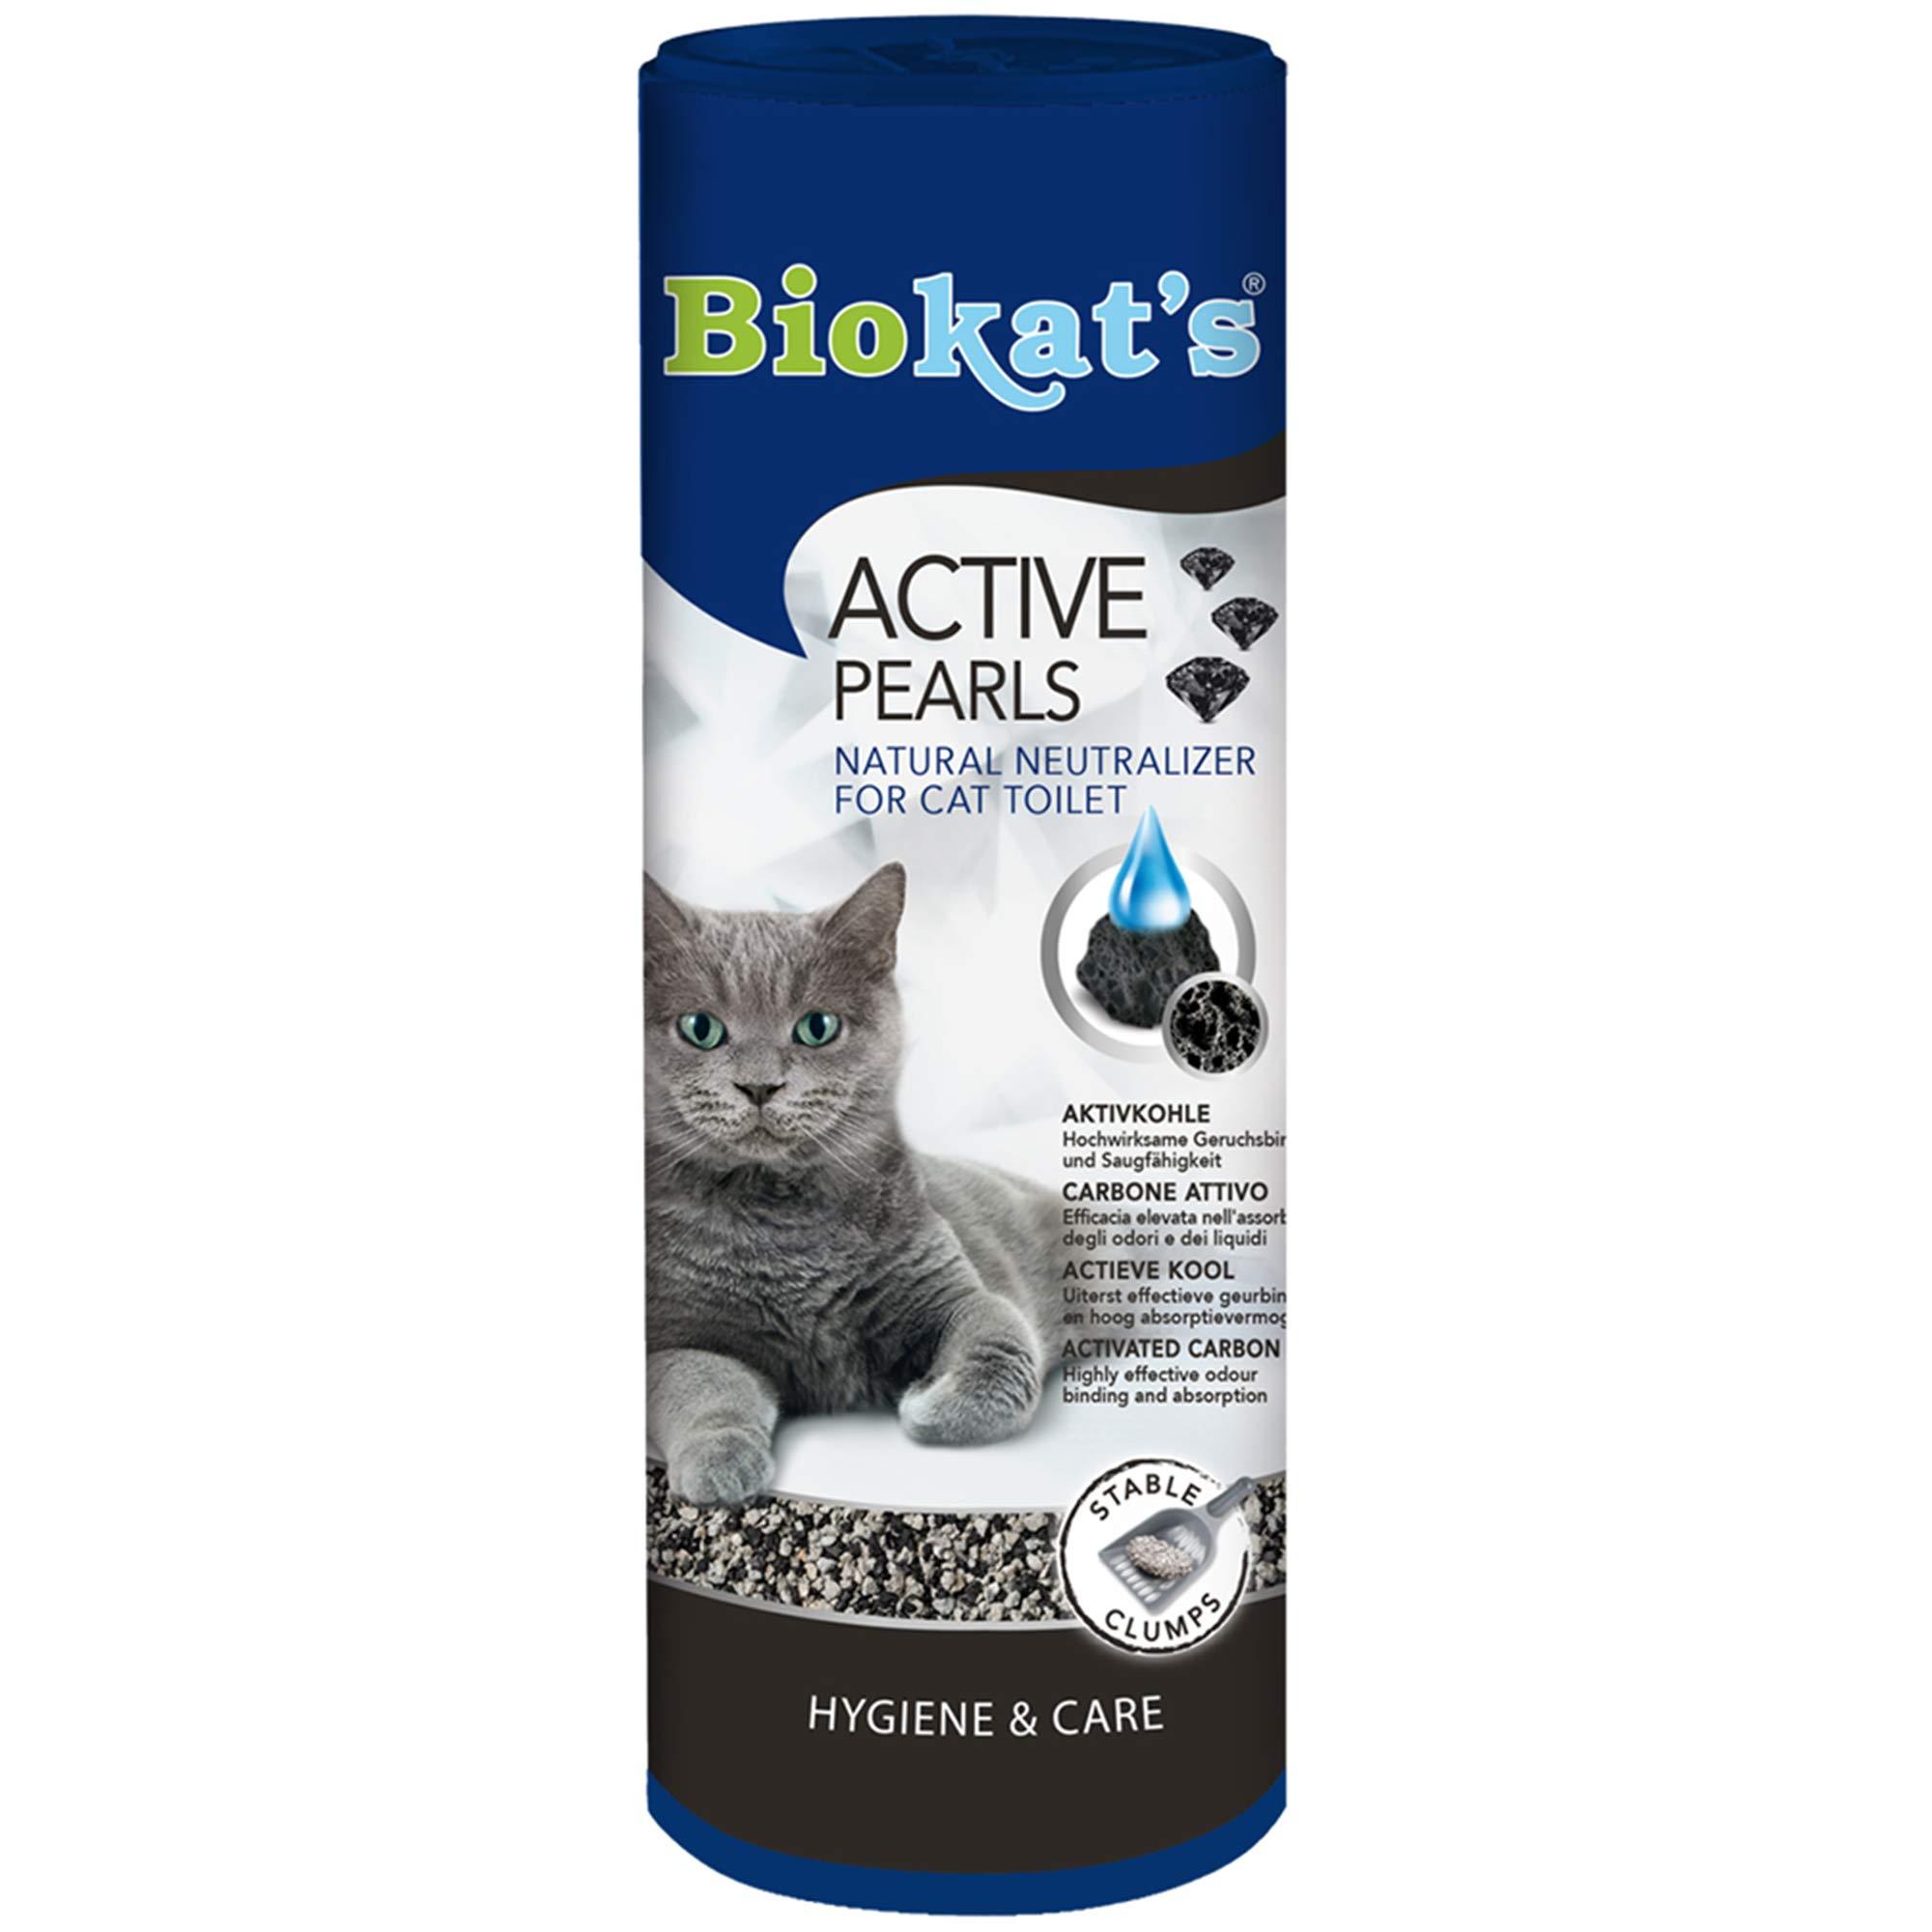 Biokats Active Pearls con carbón activo – Aditivo neutralizador ...